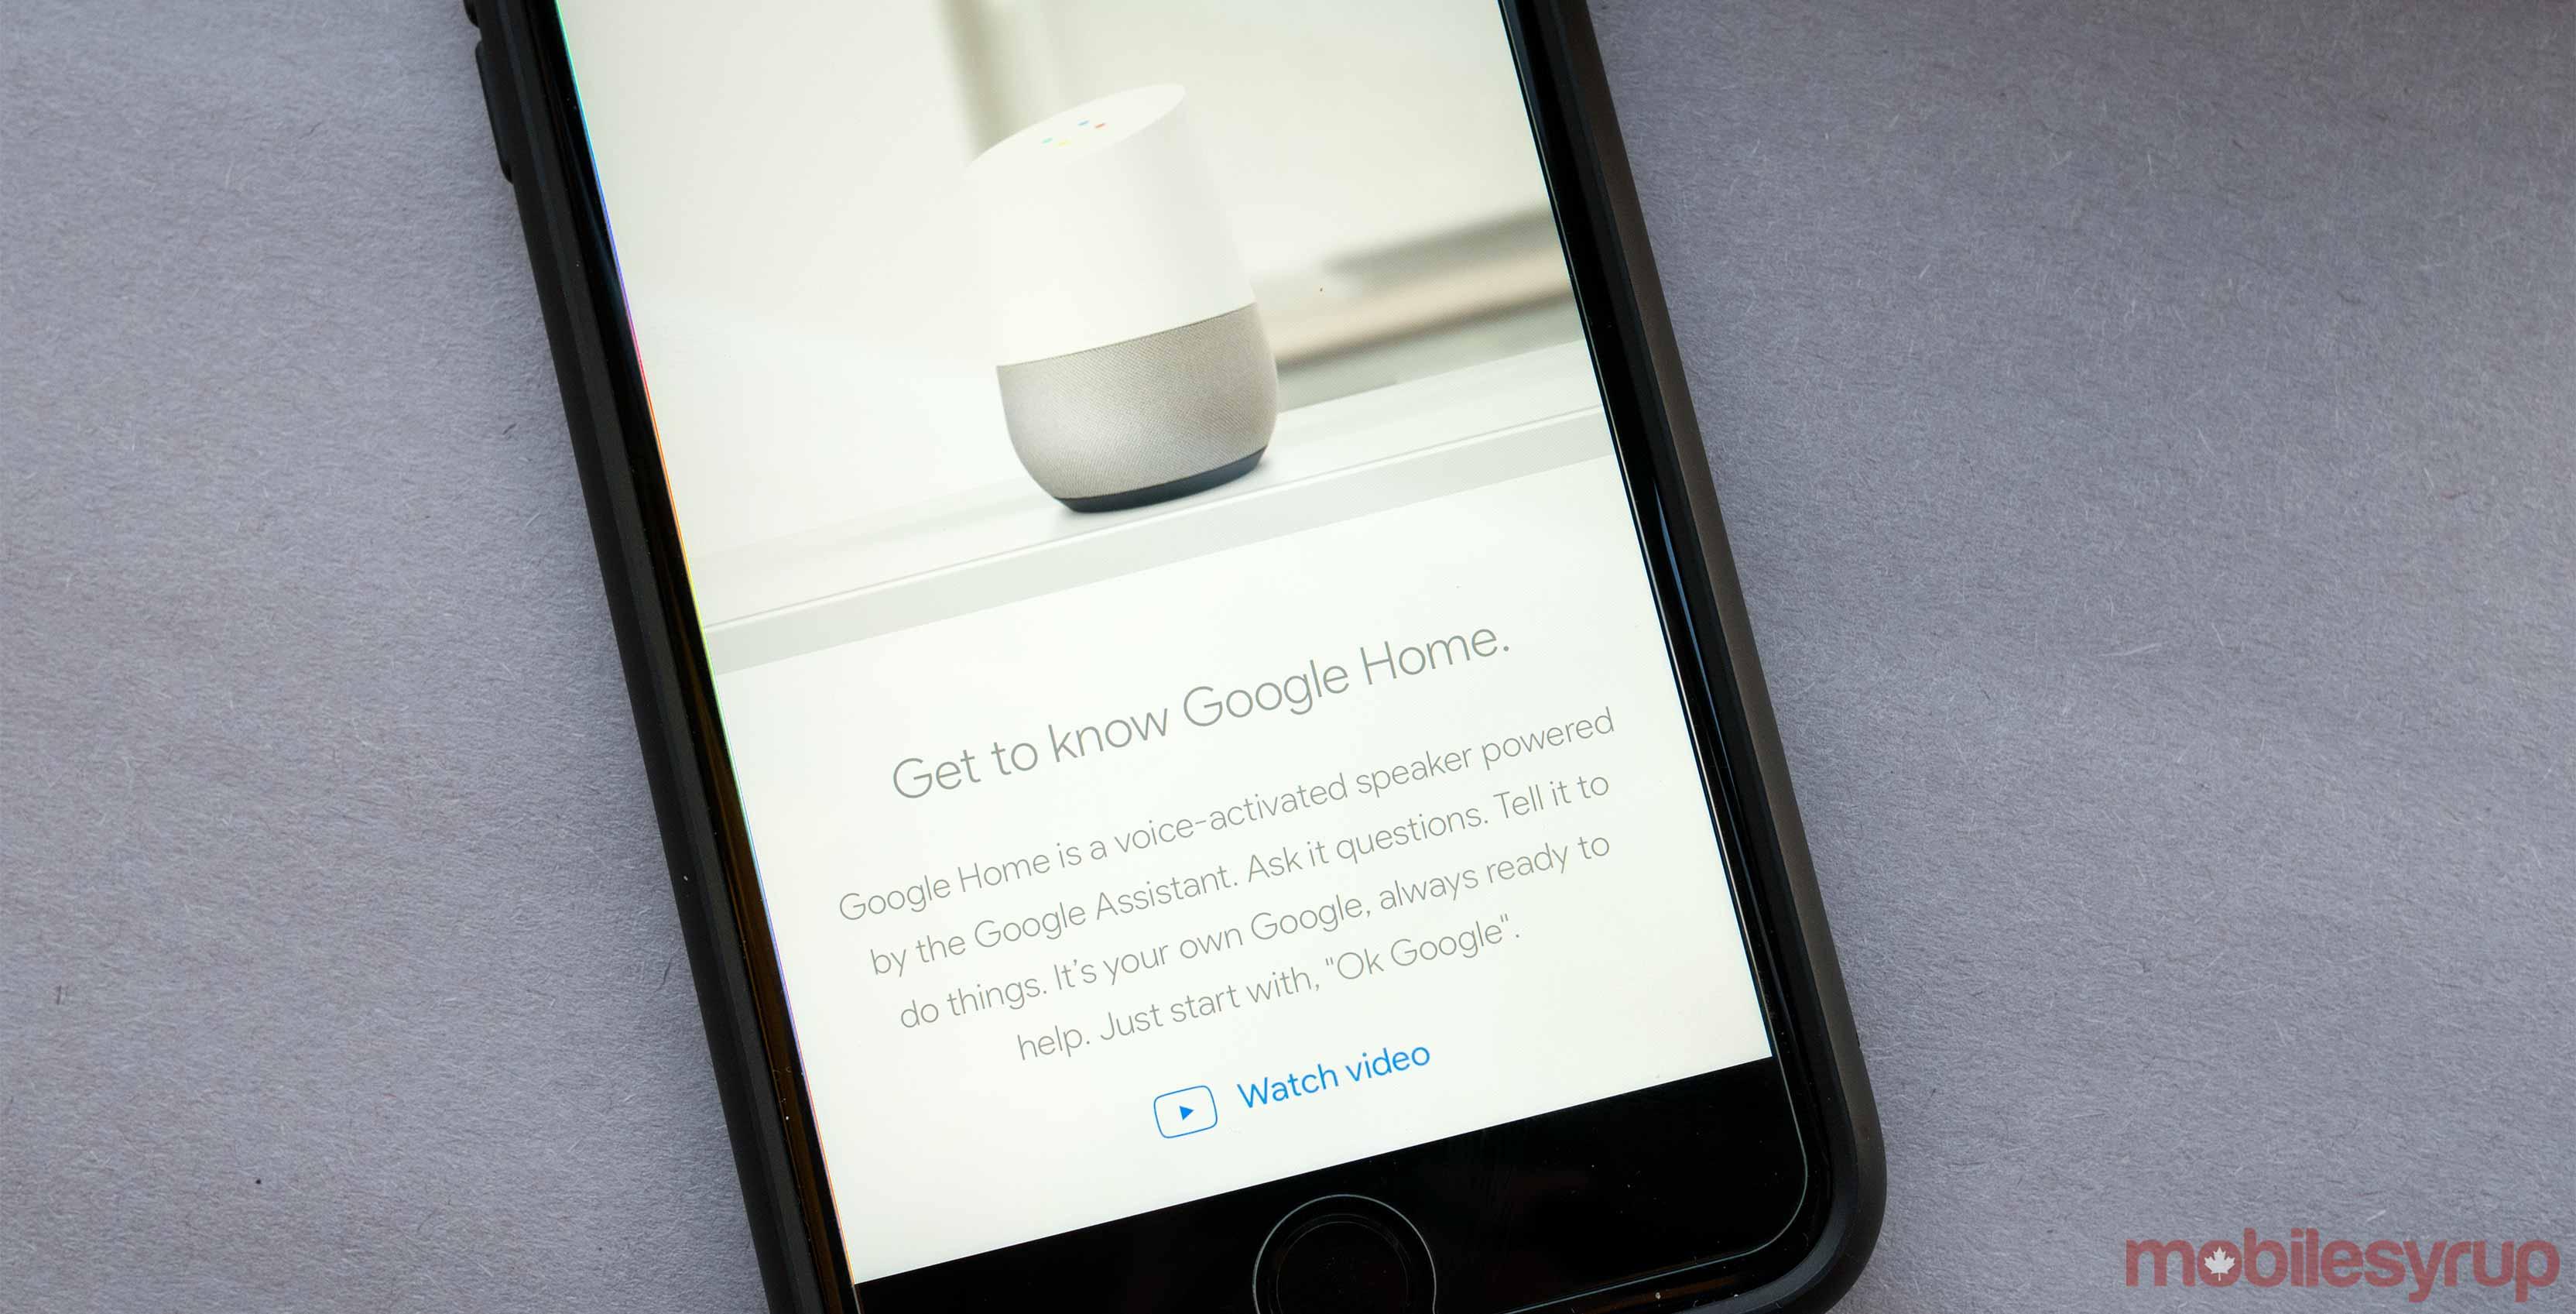 Google Home on smartphone